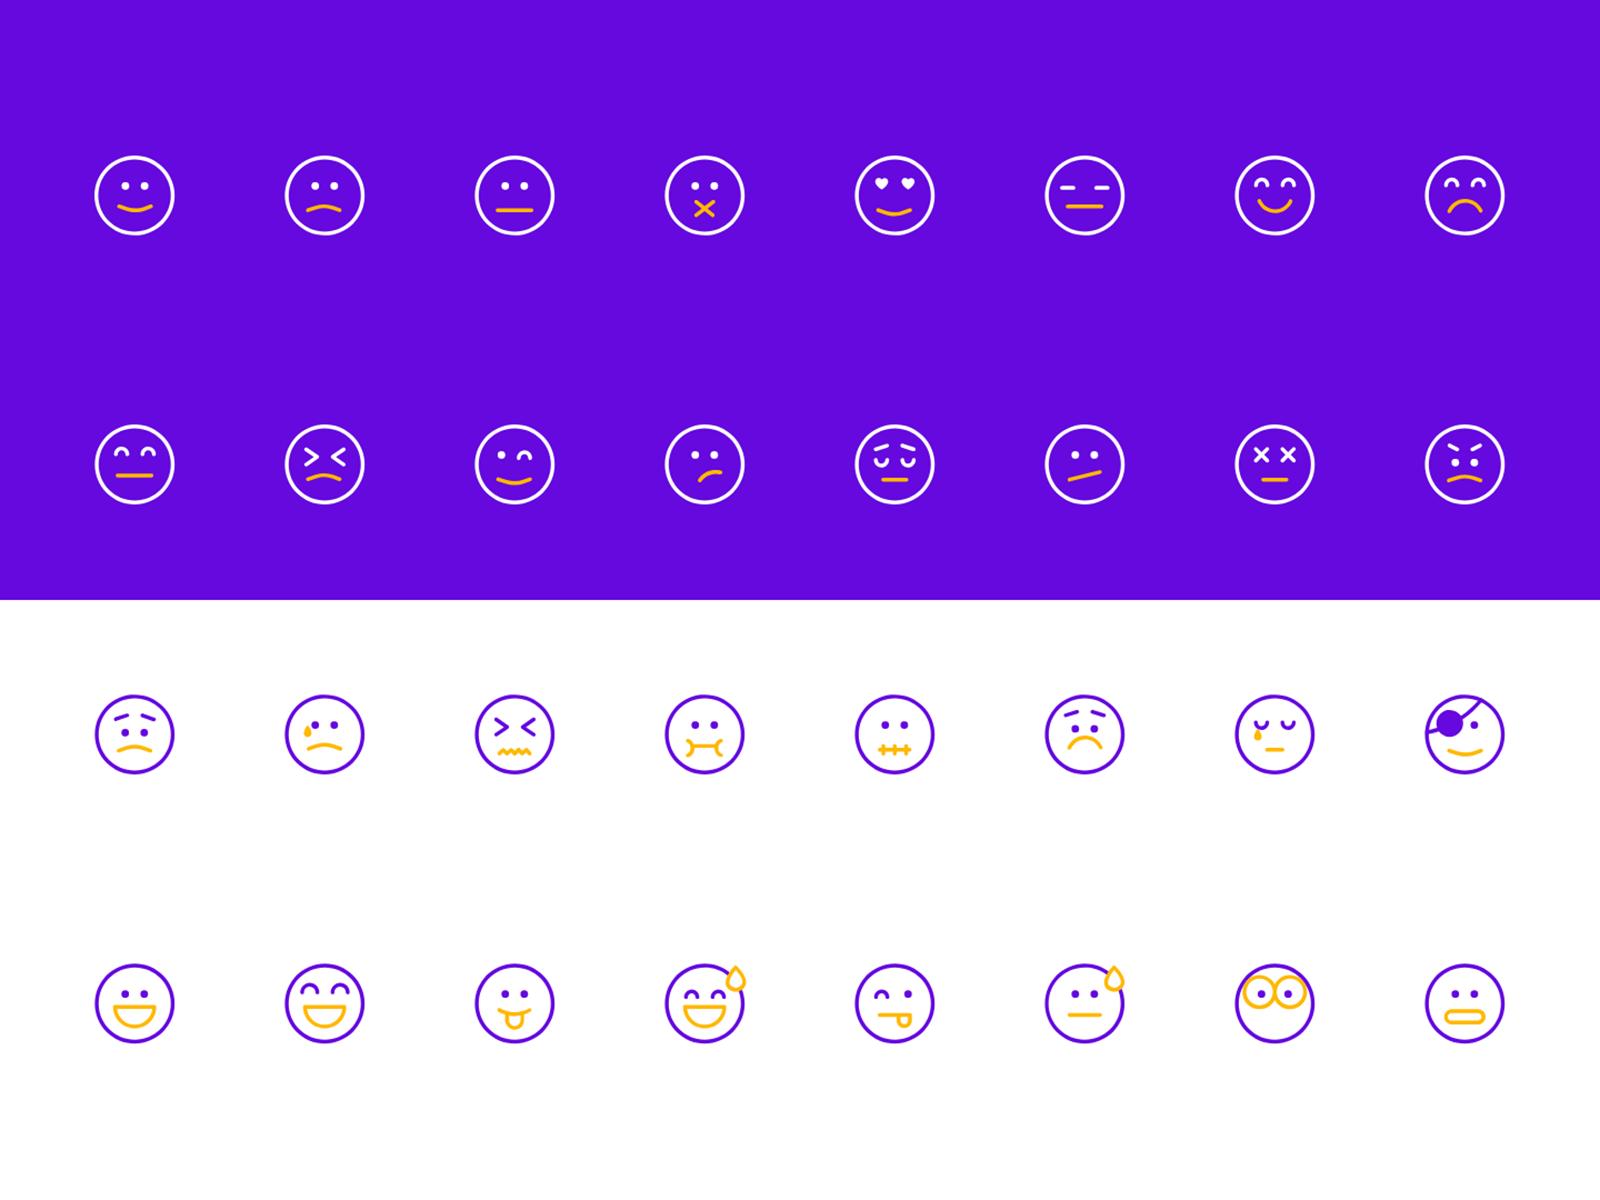 Emoji Icon Set 表情图标集 .ai & .xd素材下载 图标-第1张